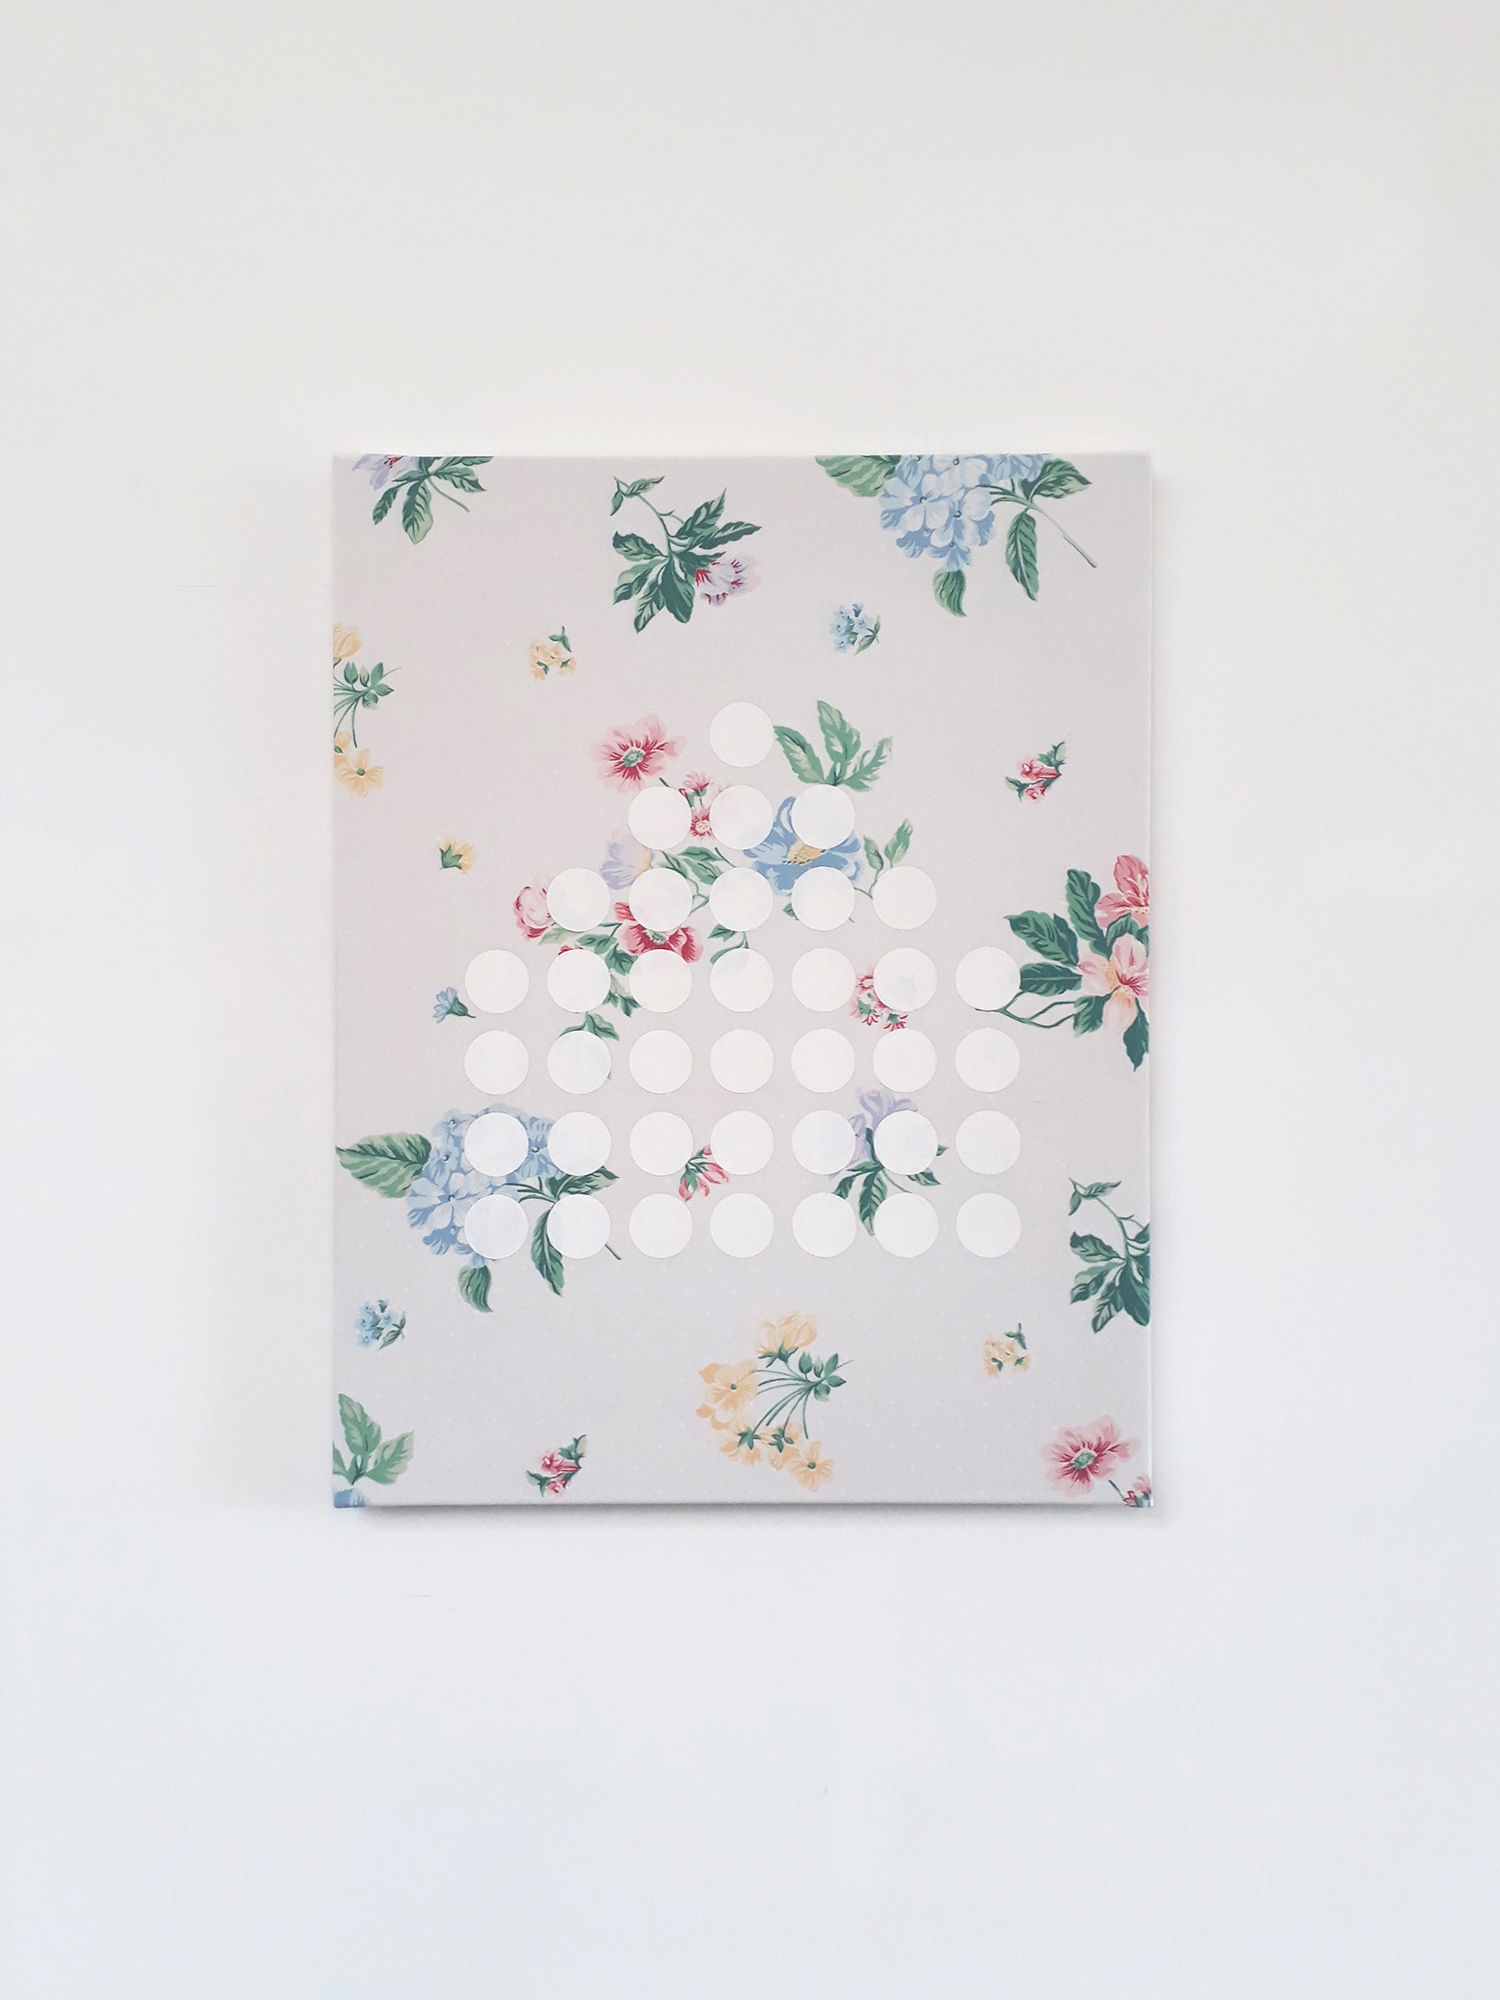 Halftone, 2017 Matt emulsion on pillowcase  46 x 35 cm